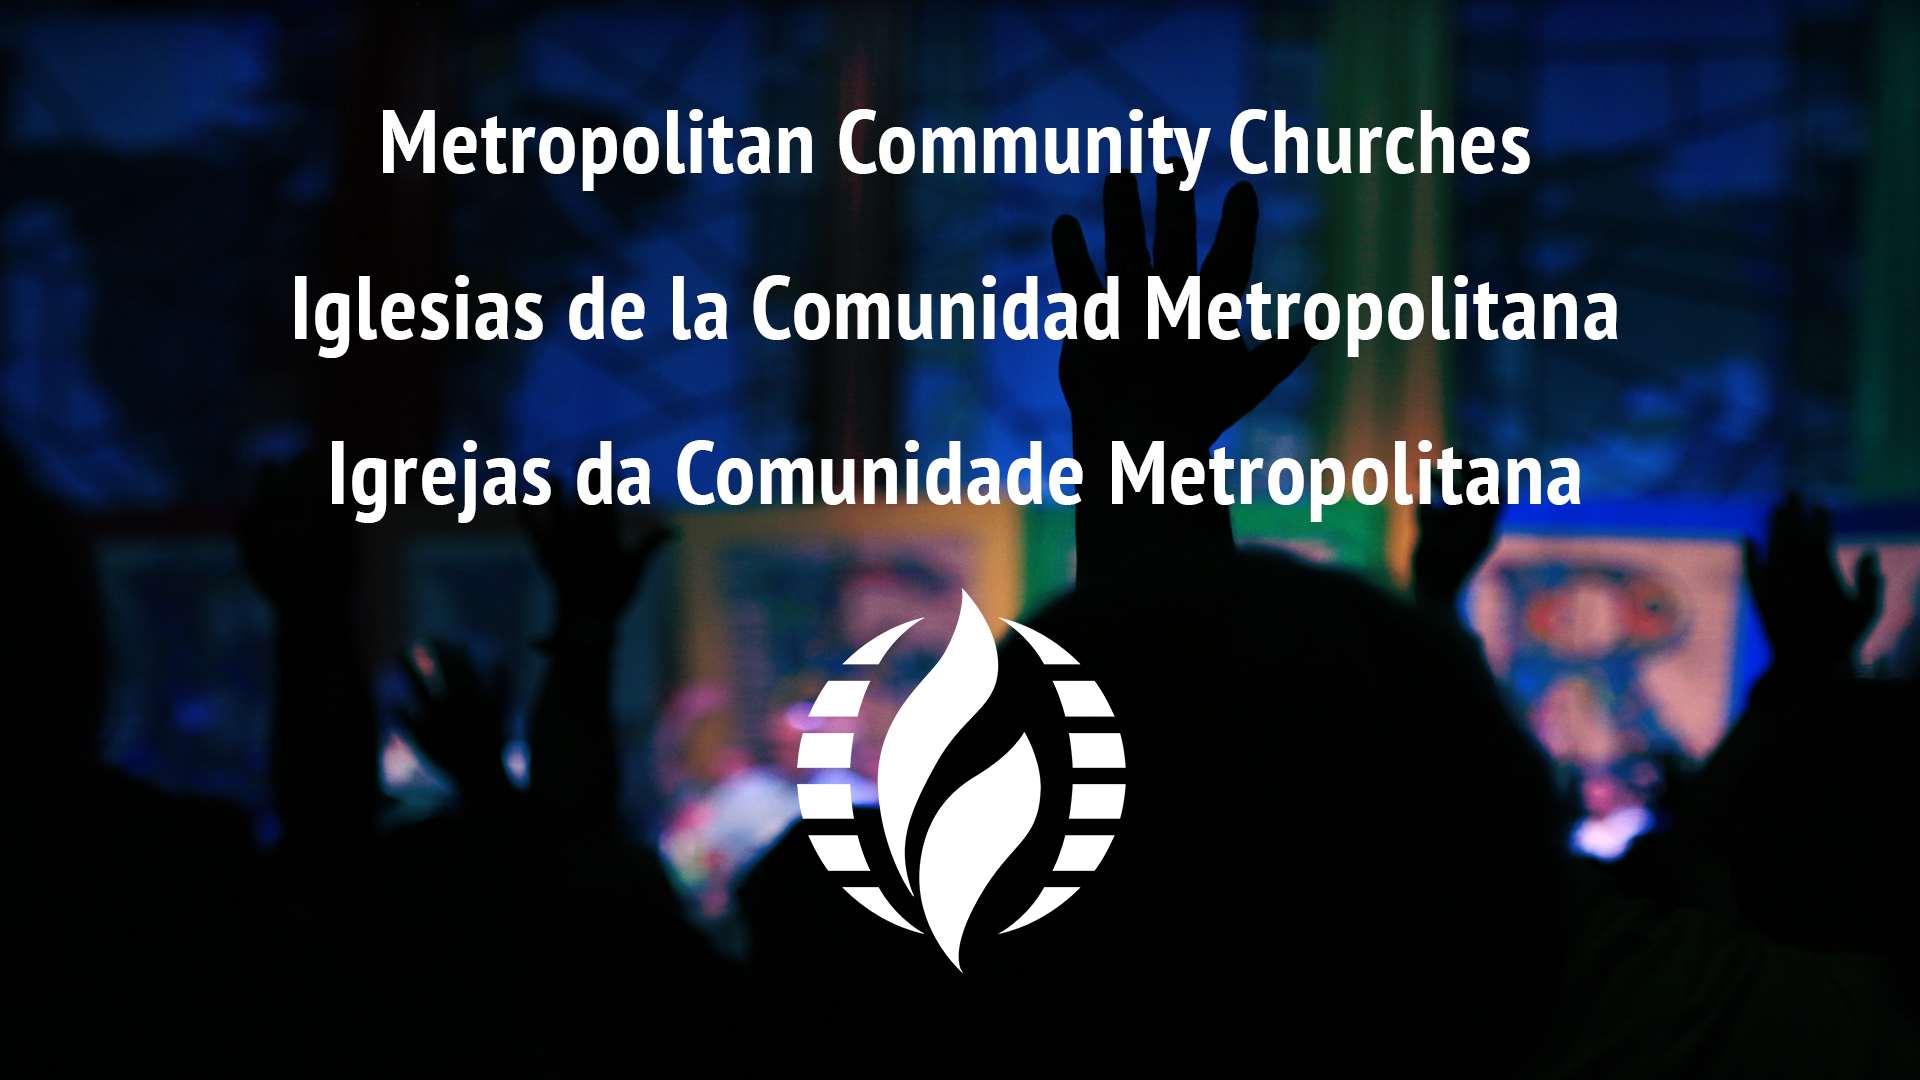 Welcome to Metropolitan Community Churches